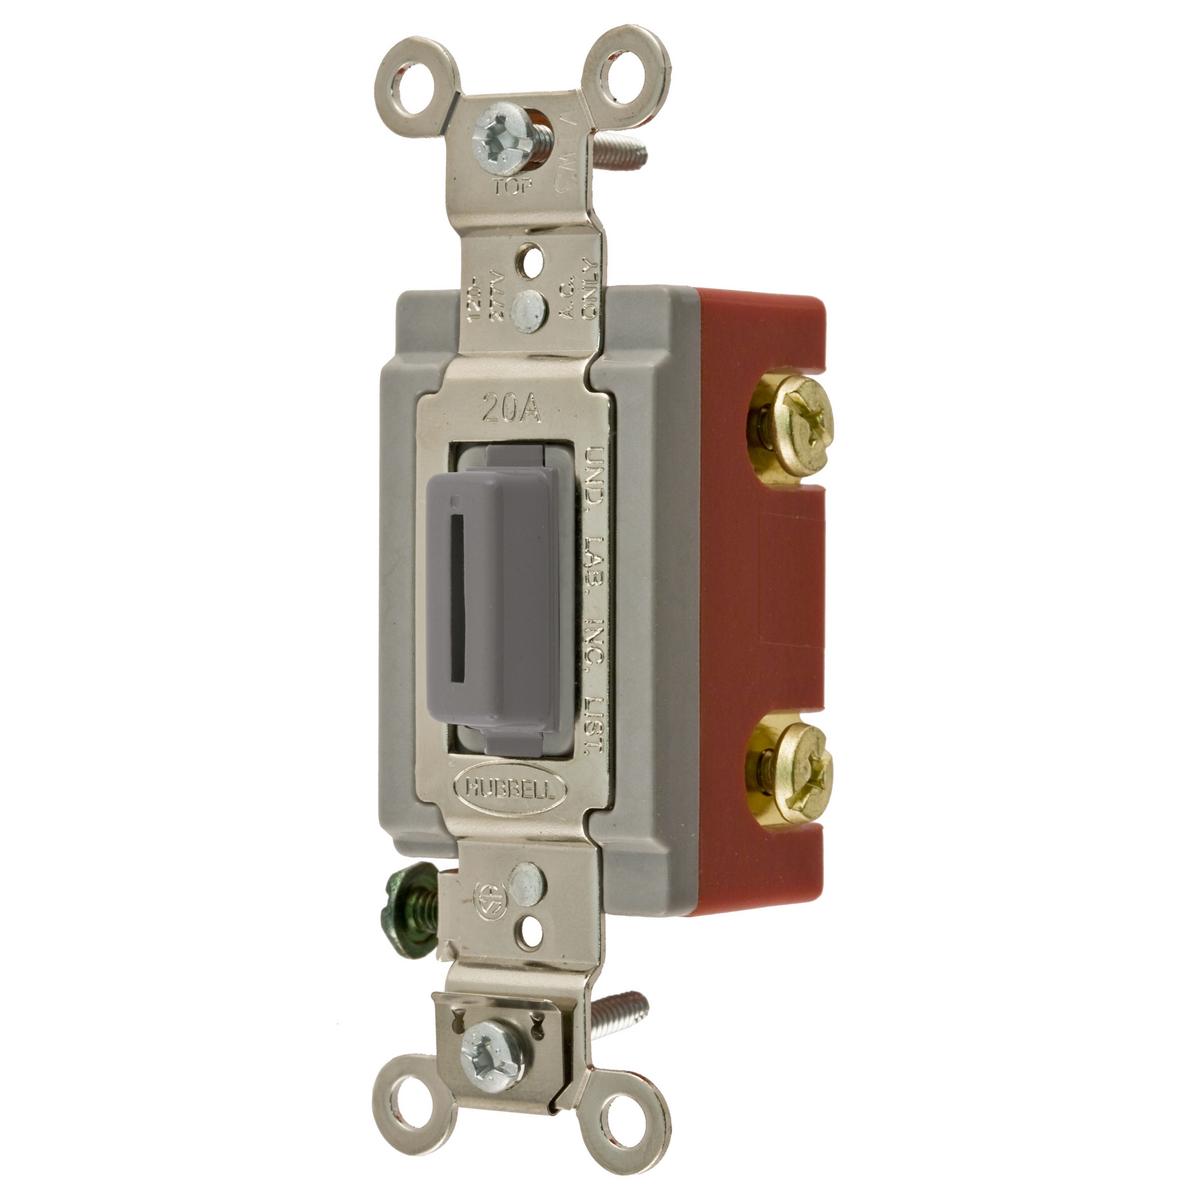 Wiring Device-KellemsHBL1221LG